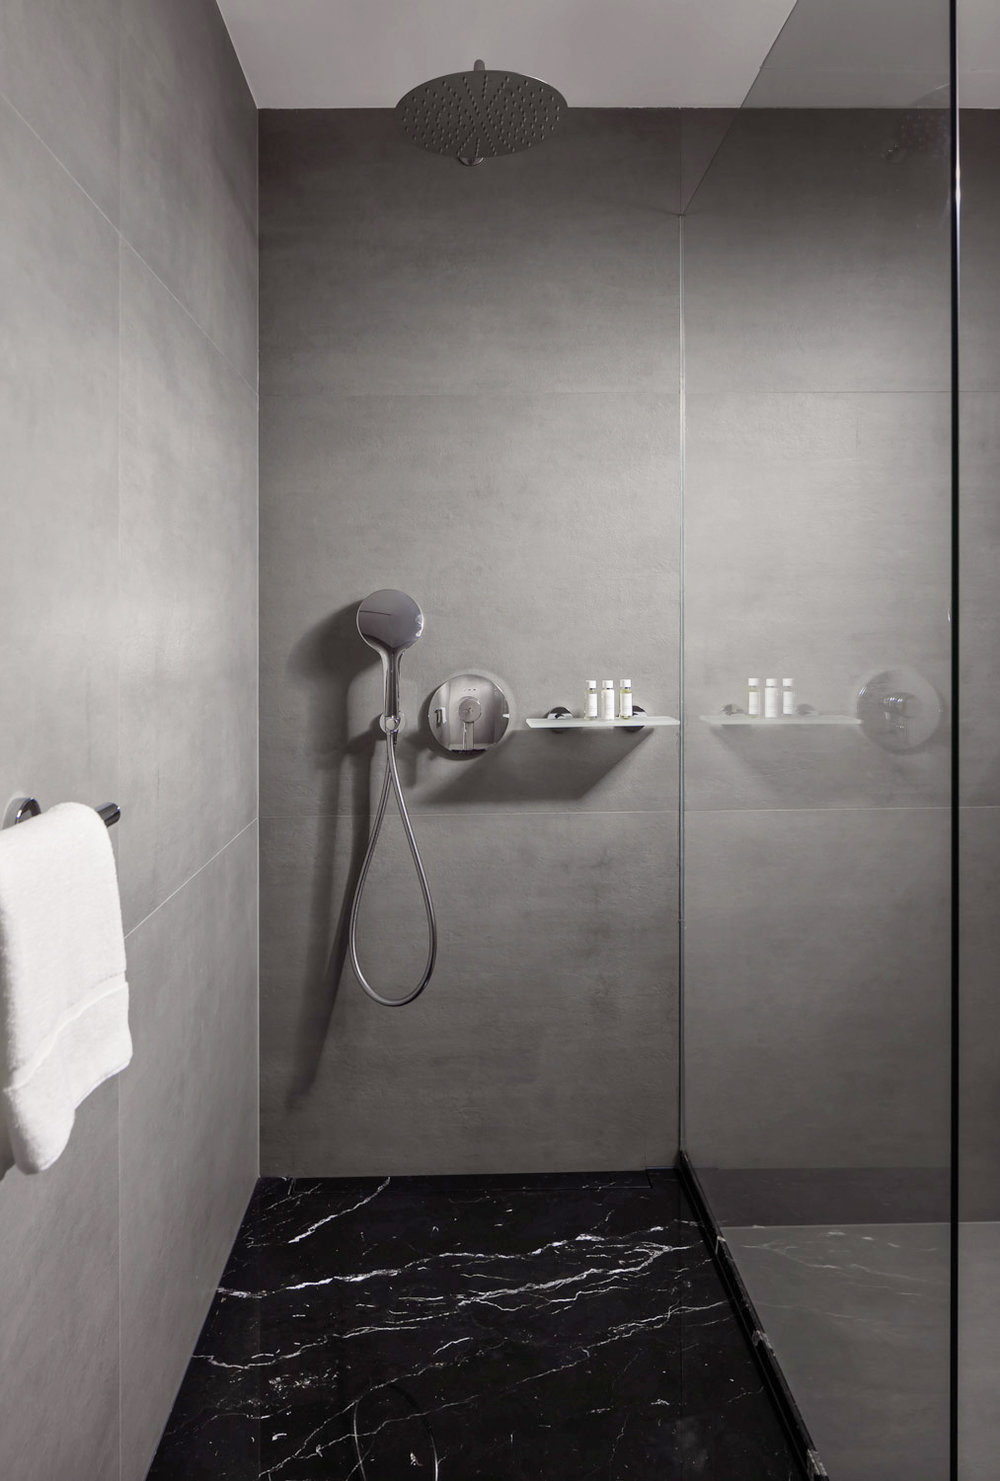 18-22-Moods-Koupelna3.JPG